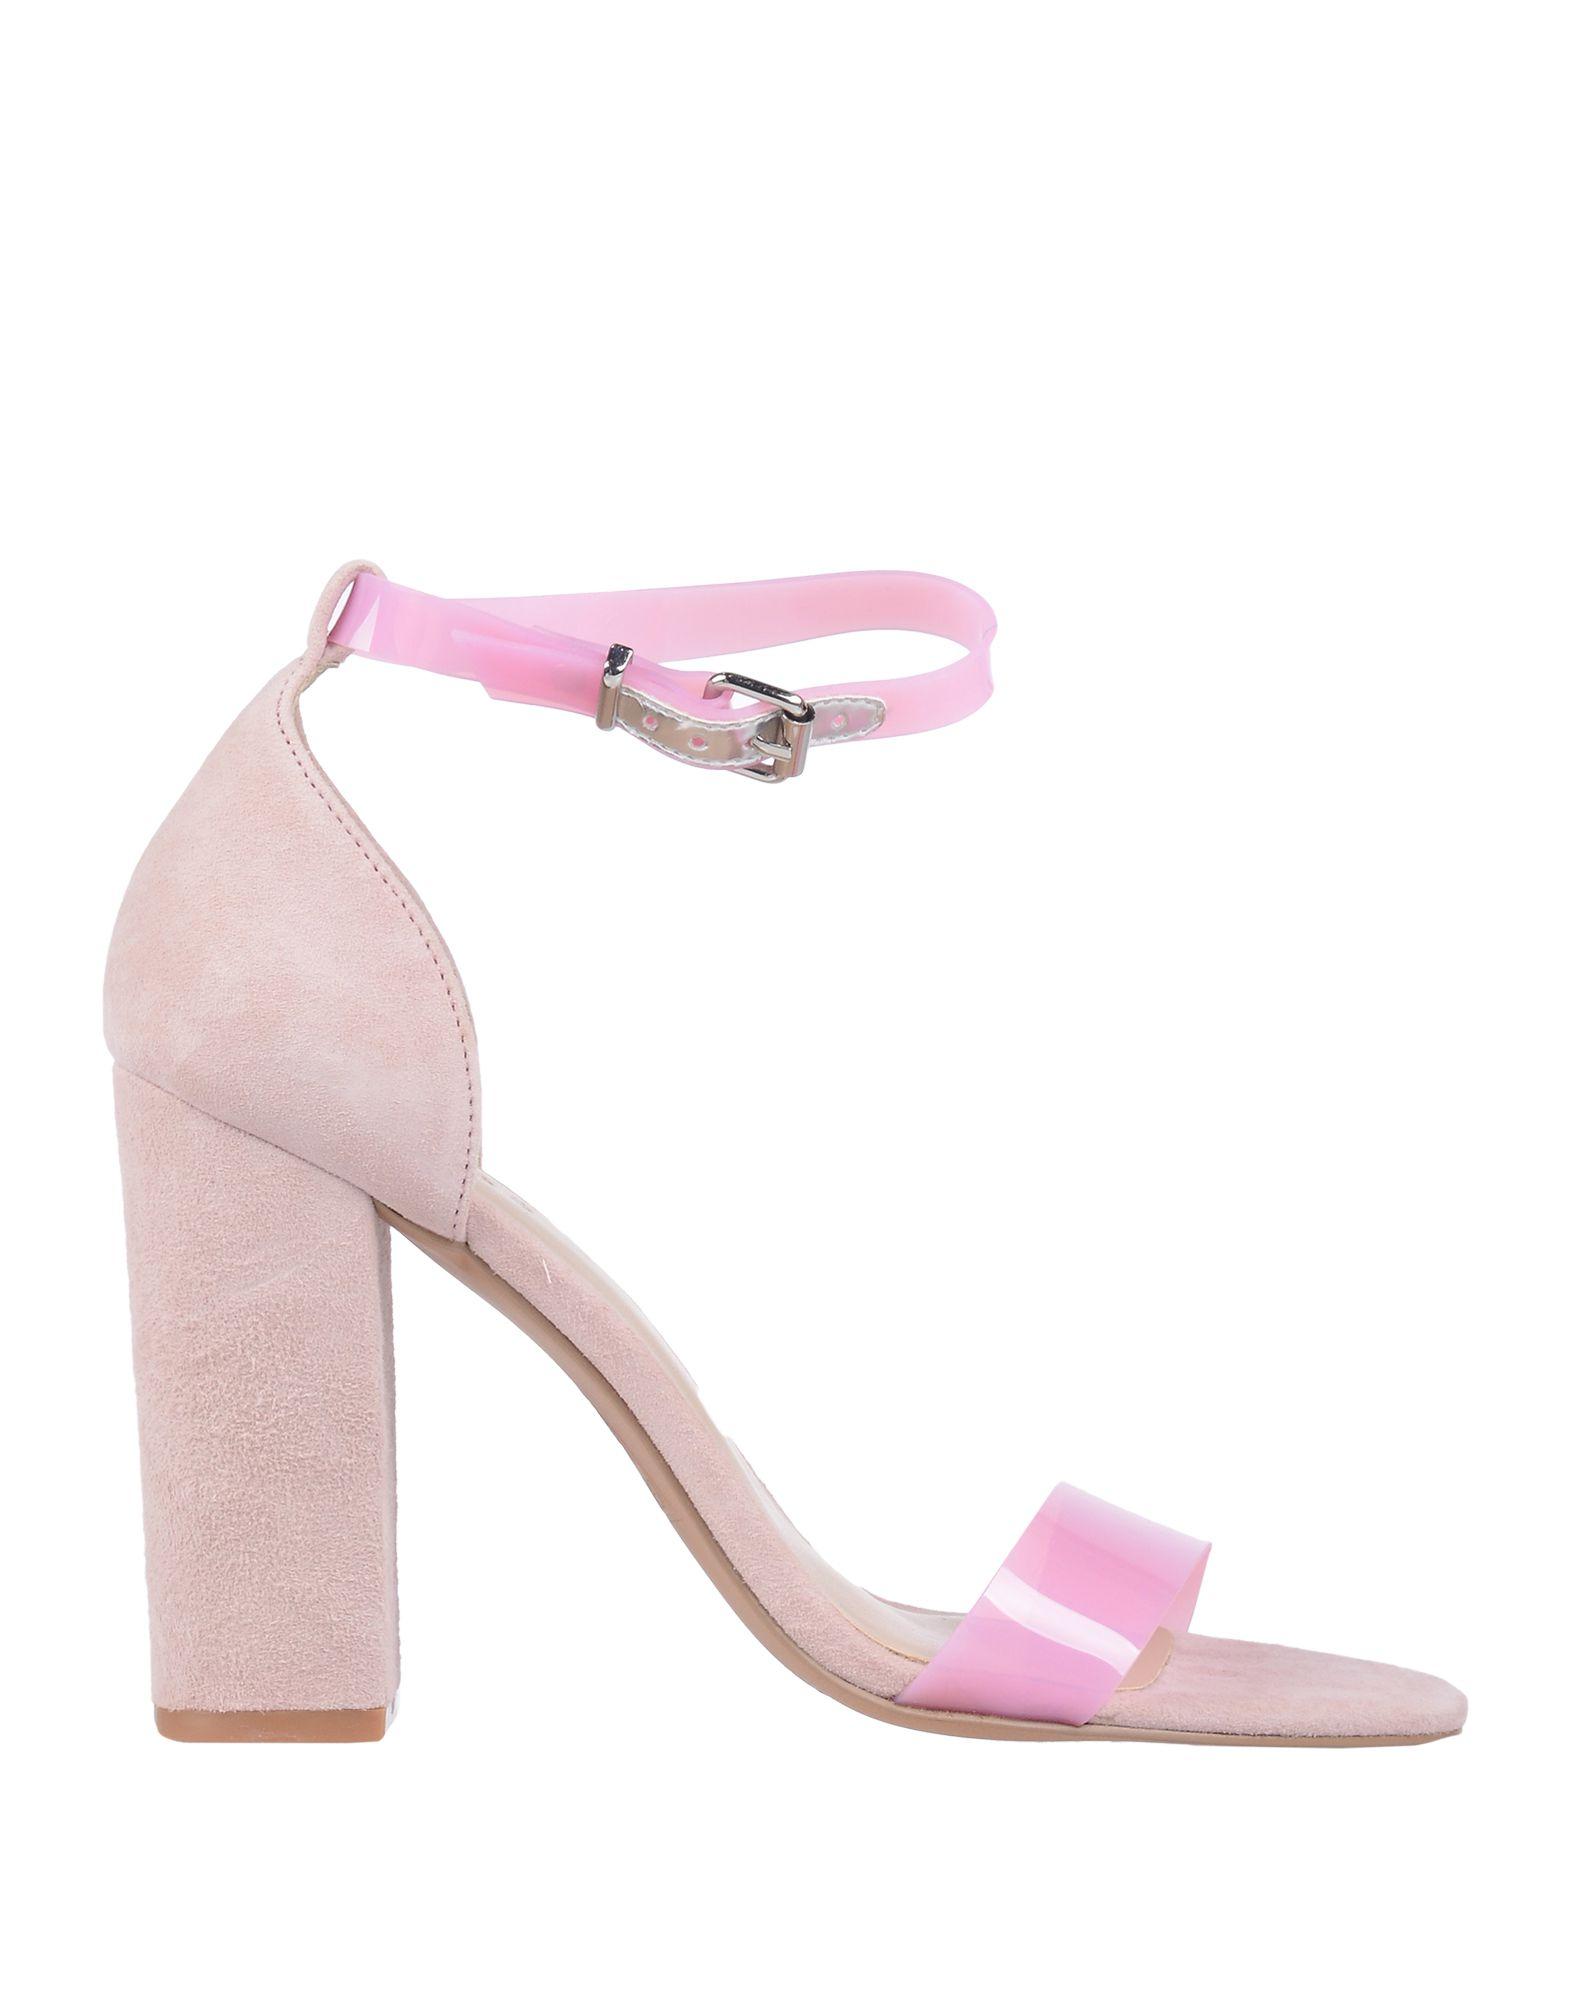 Guess Sandals  - Women Guess Sandals online on  Sandals Australia - 11521610UD f78e65